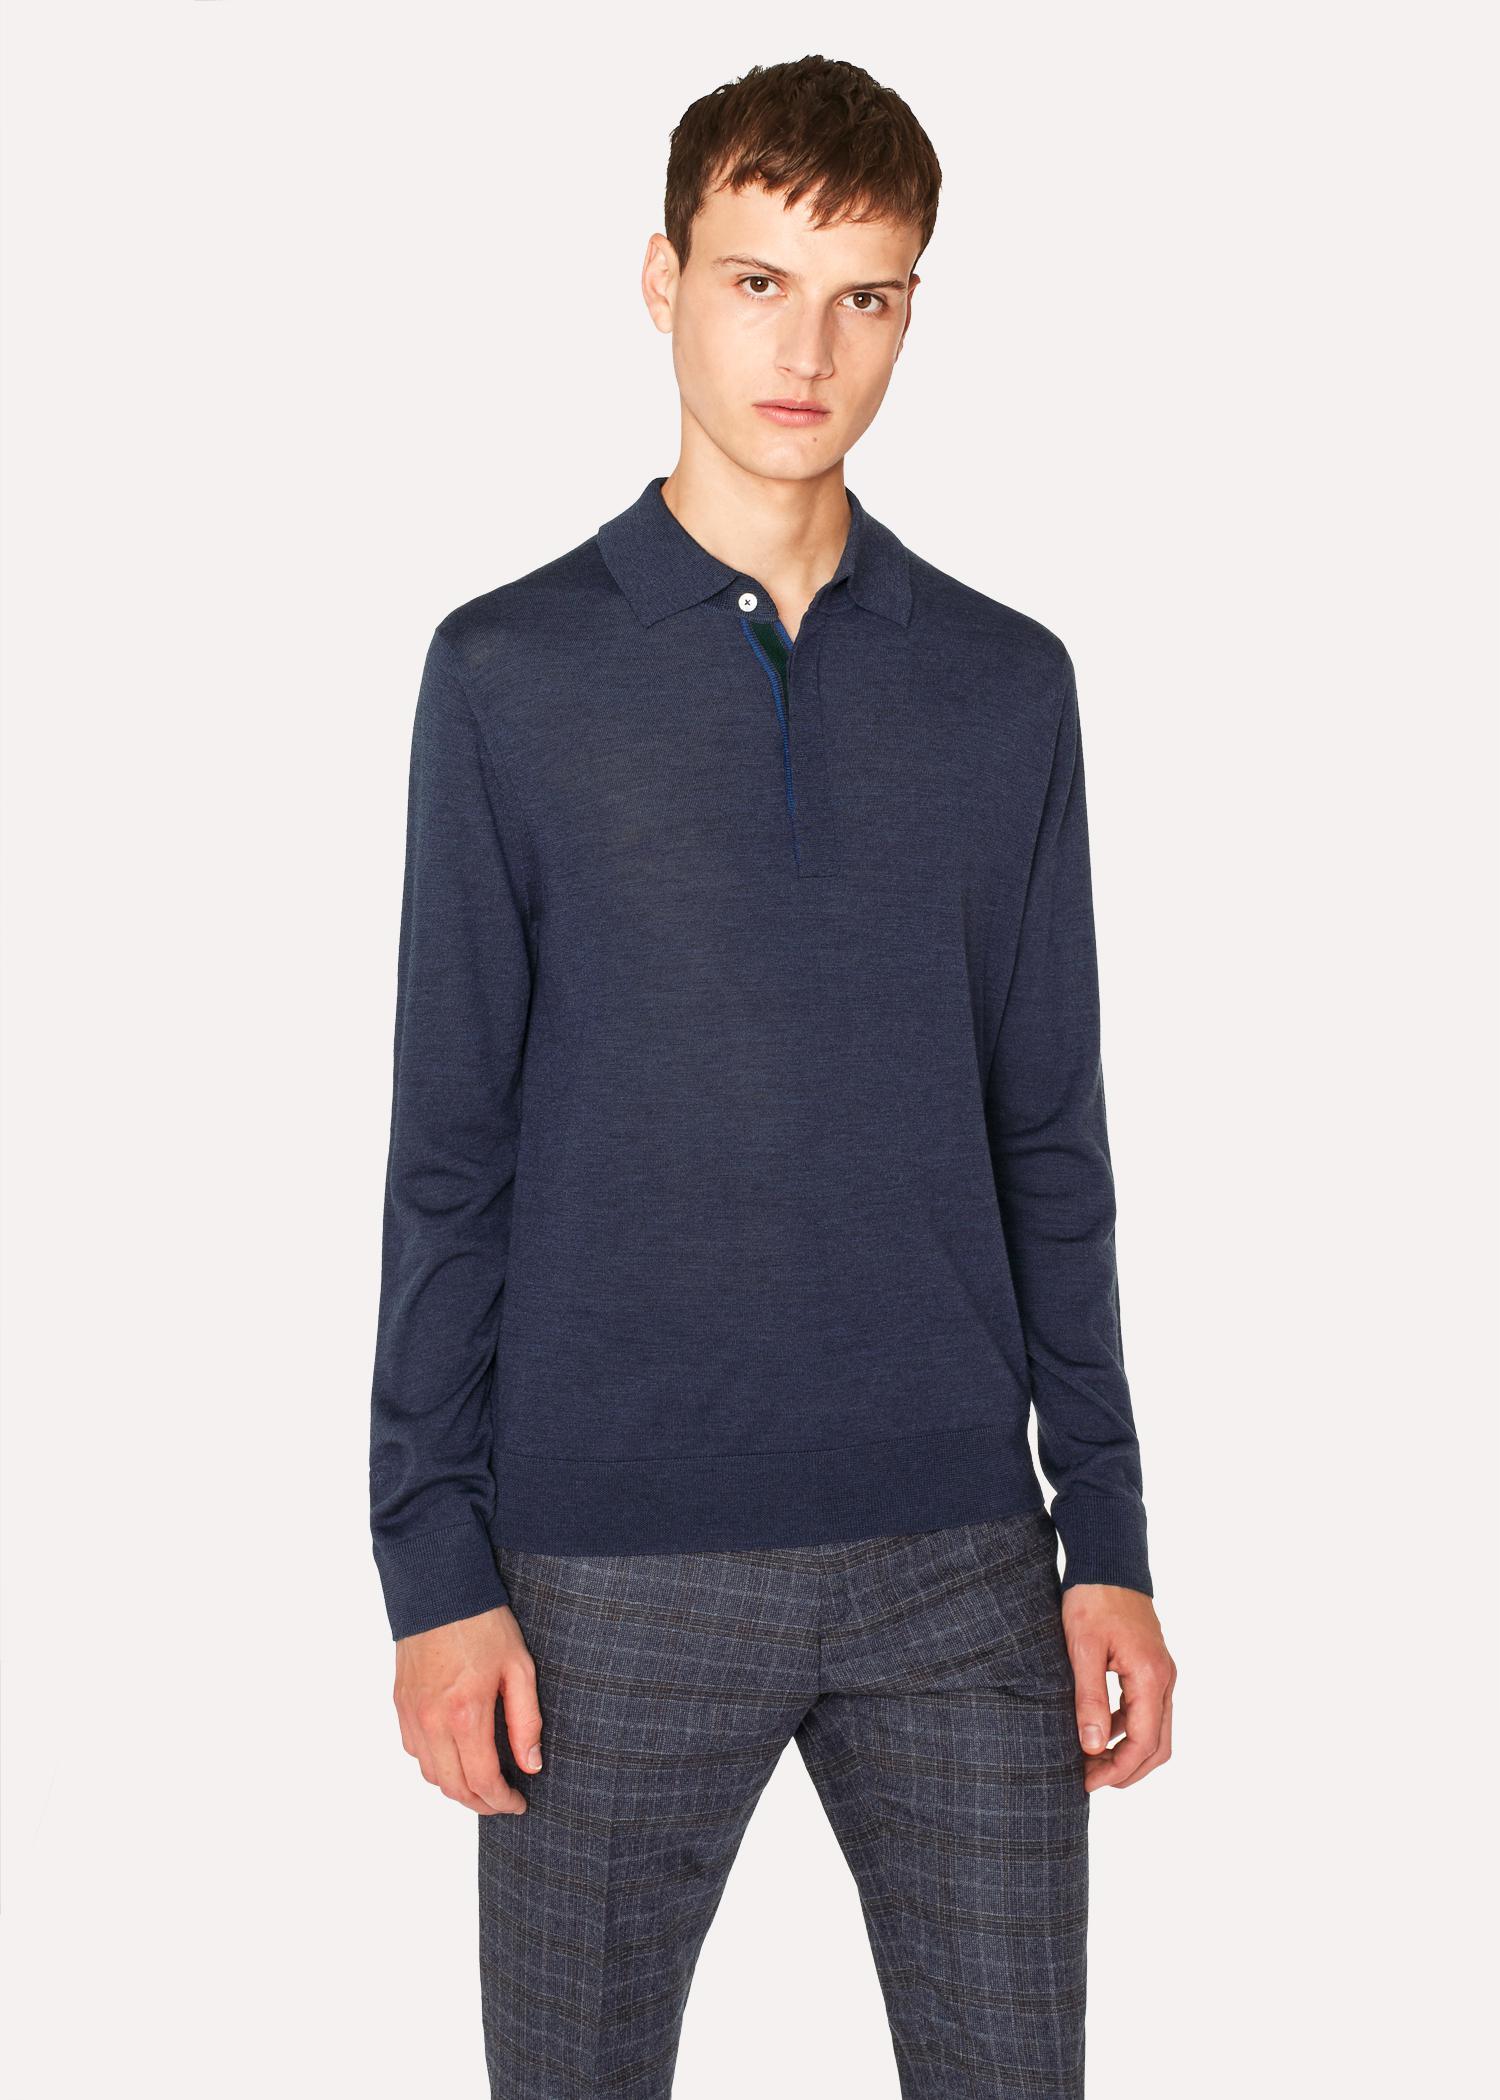 Paul smith slate blue merino wool long sleeve polo shirt for Long sleeve wool polo shirts